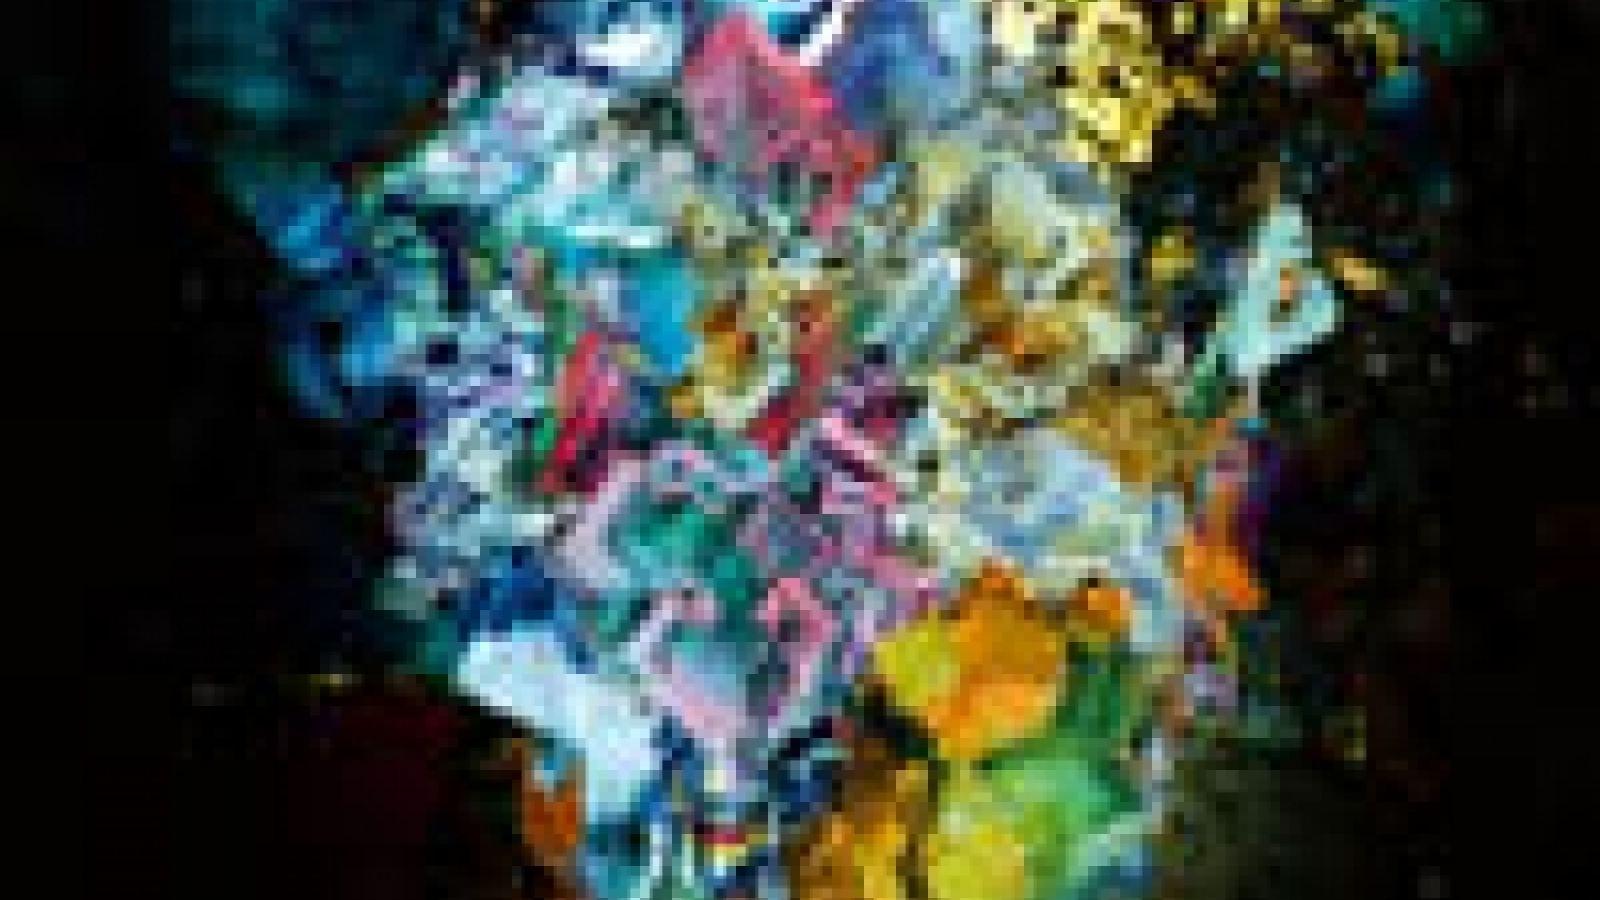 Die RADWIMPS mit neuem Album © GOD CHILD RECORDS